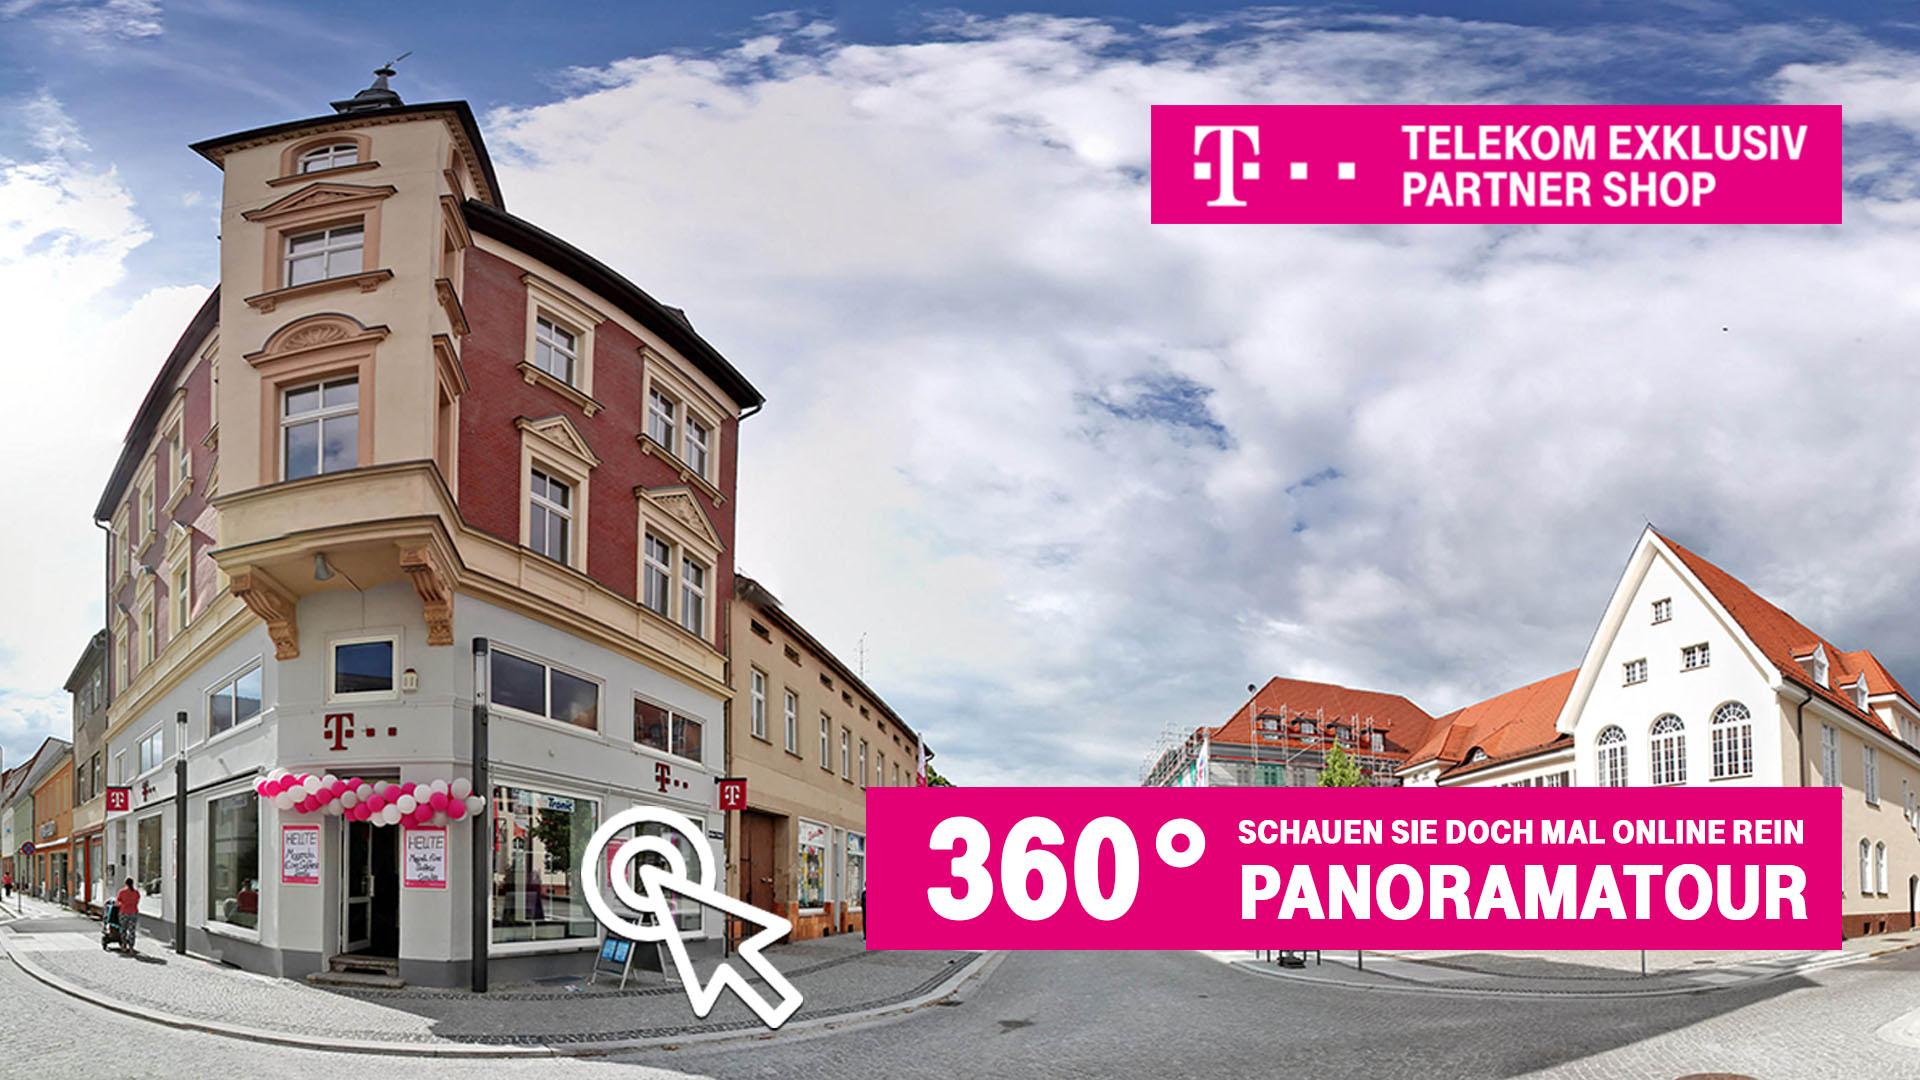 Telekom Exklusiv Partnershop - 360 Grad VR Panoramatour von Daleen.de